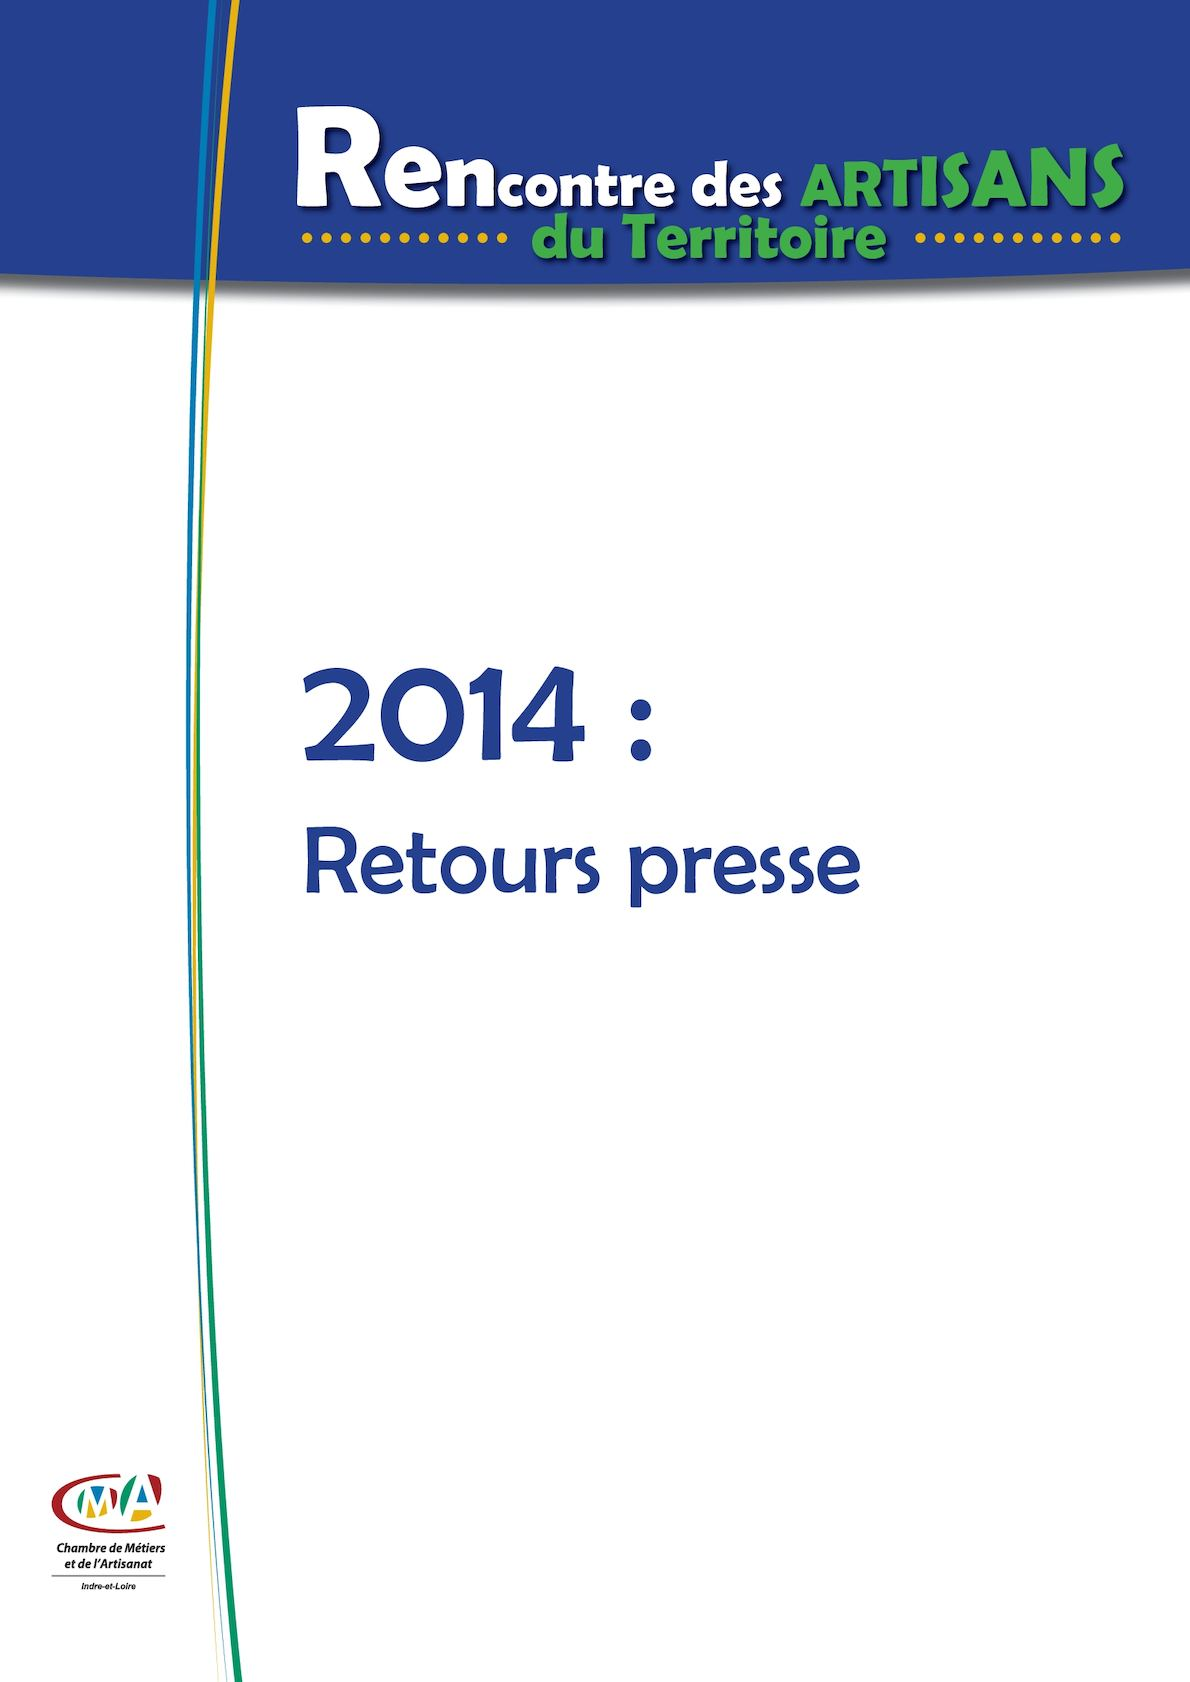 Calaméo - Retours Presse Rat 2014 2016 on